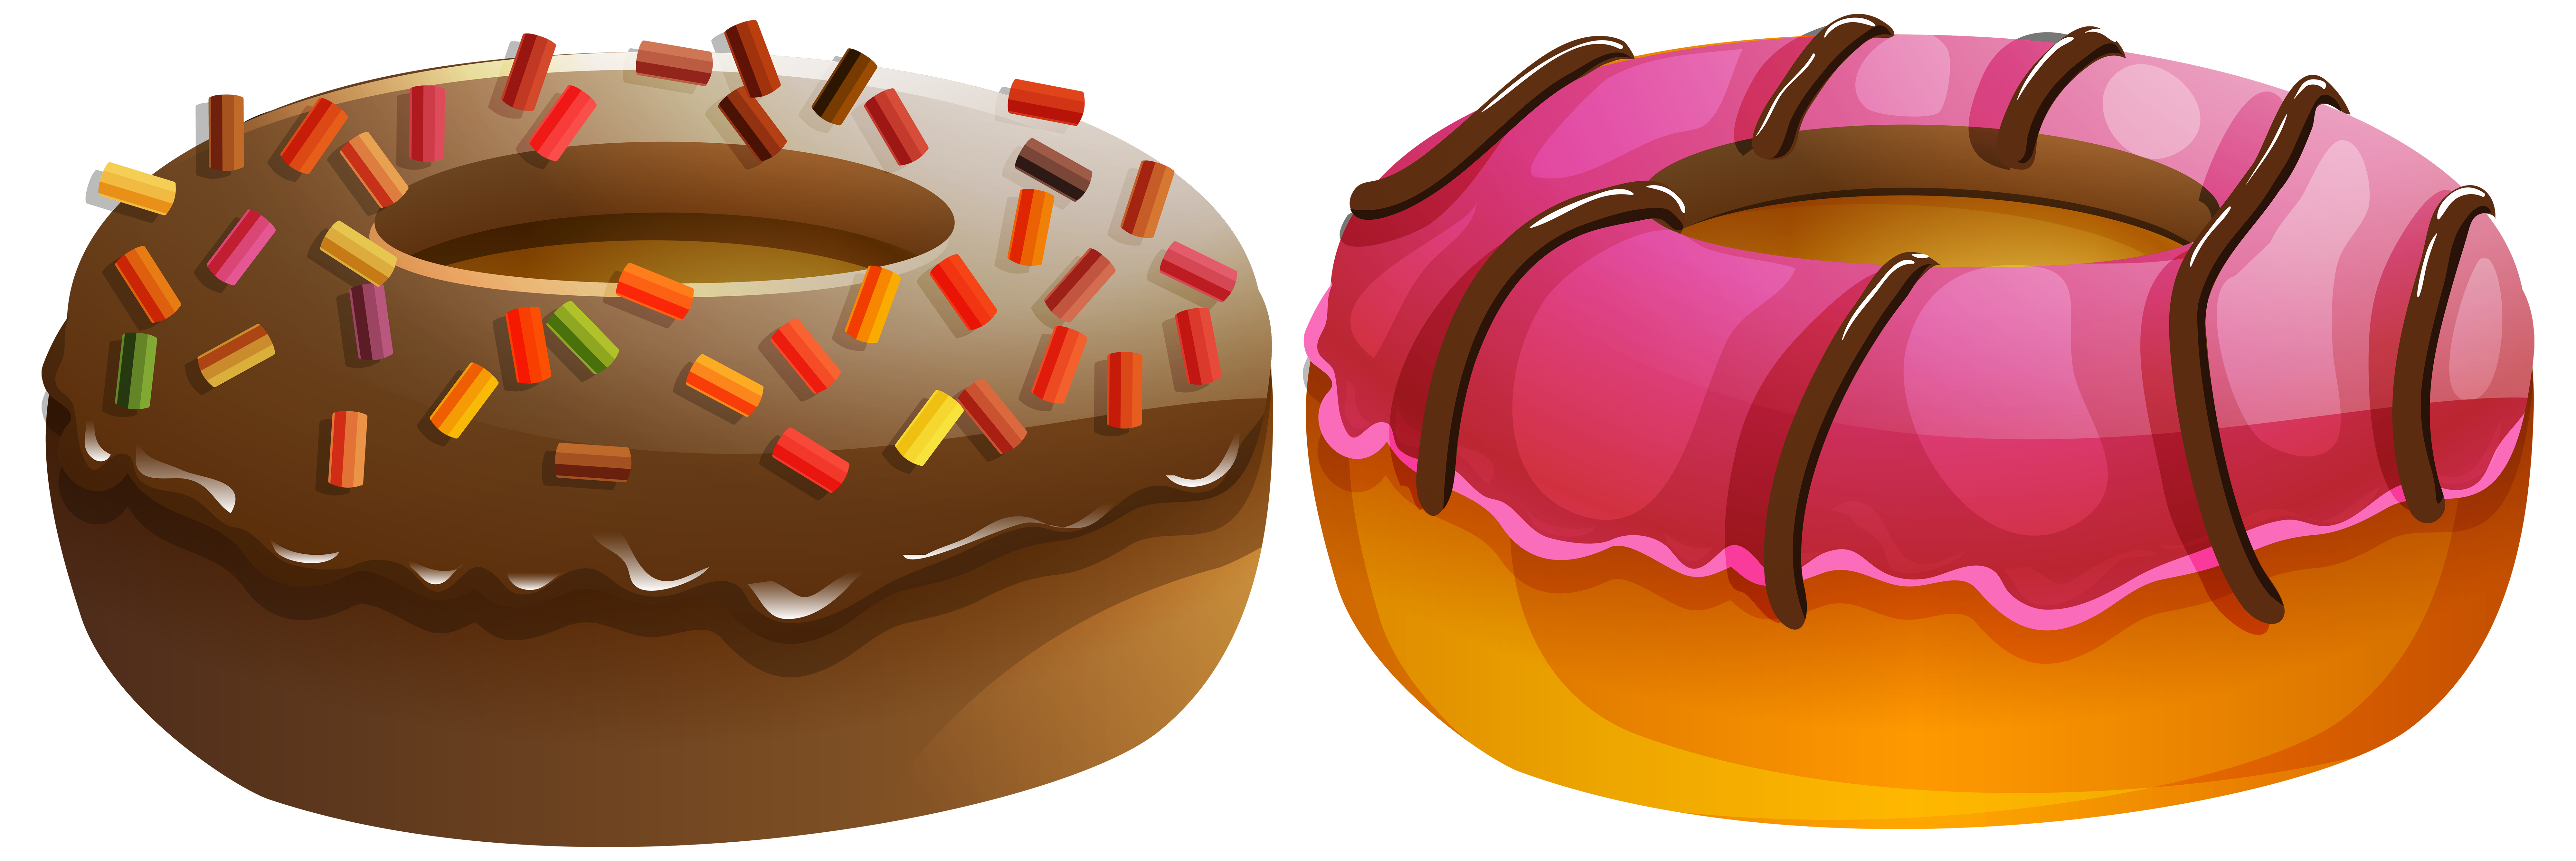 Doughnuts png clip art. Heart clipart donut